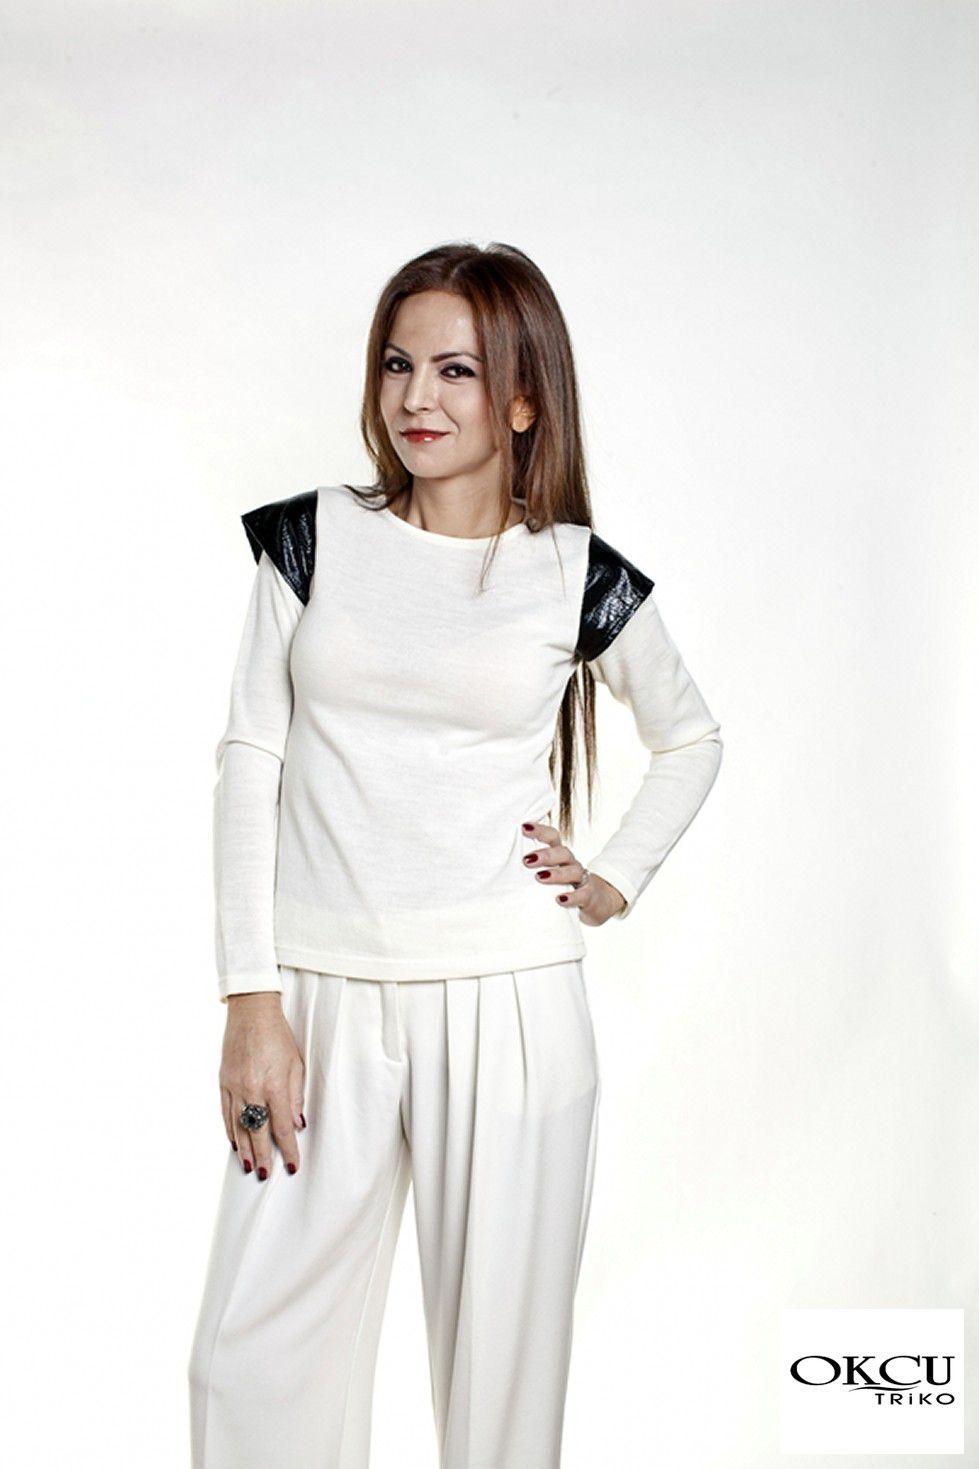 Одежда Okcu